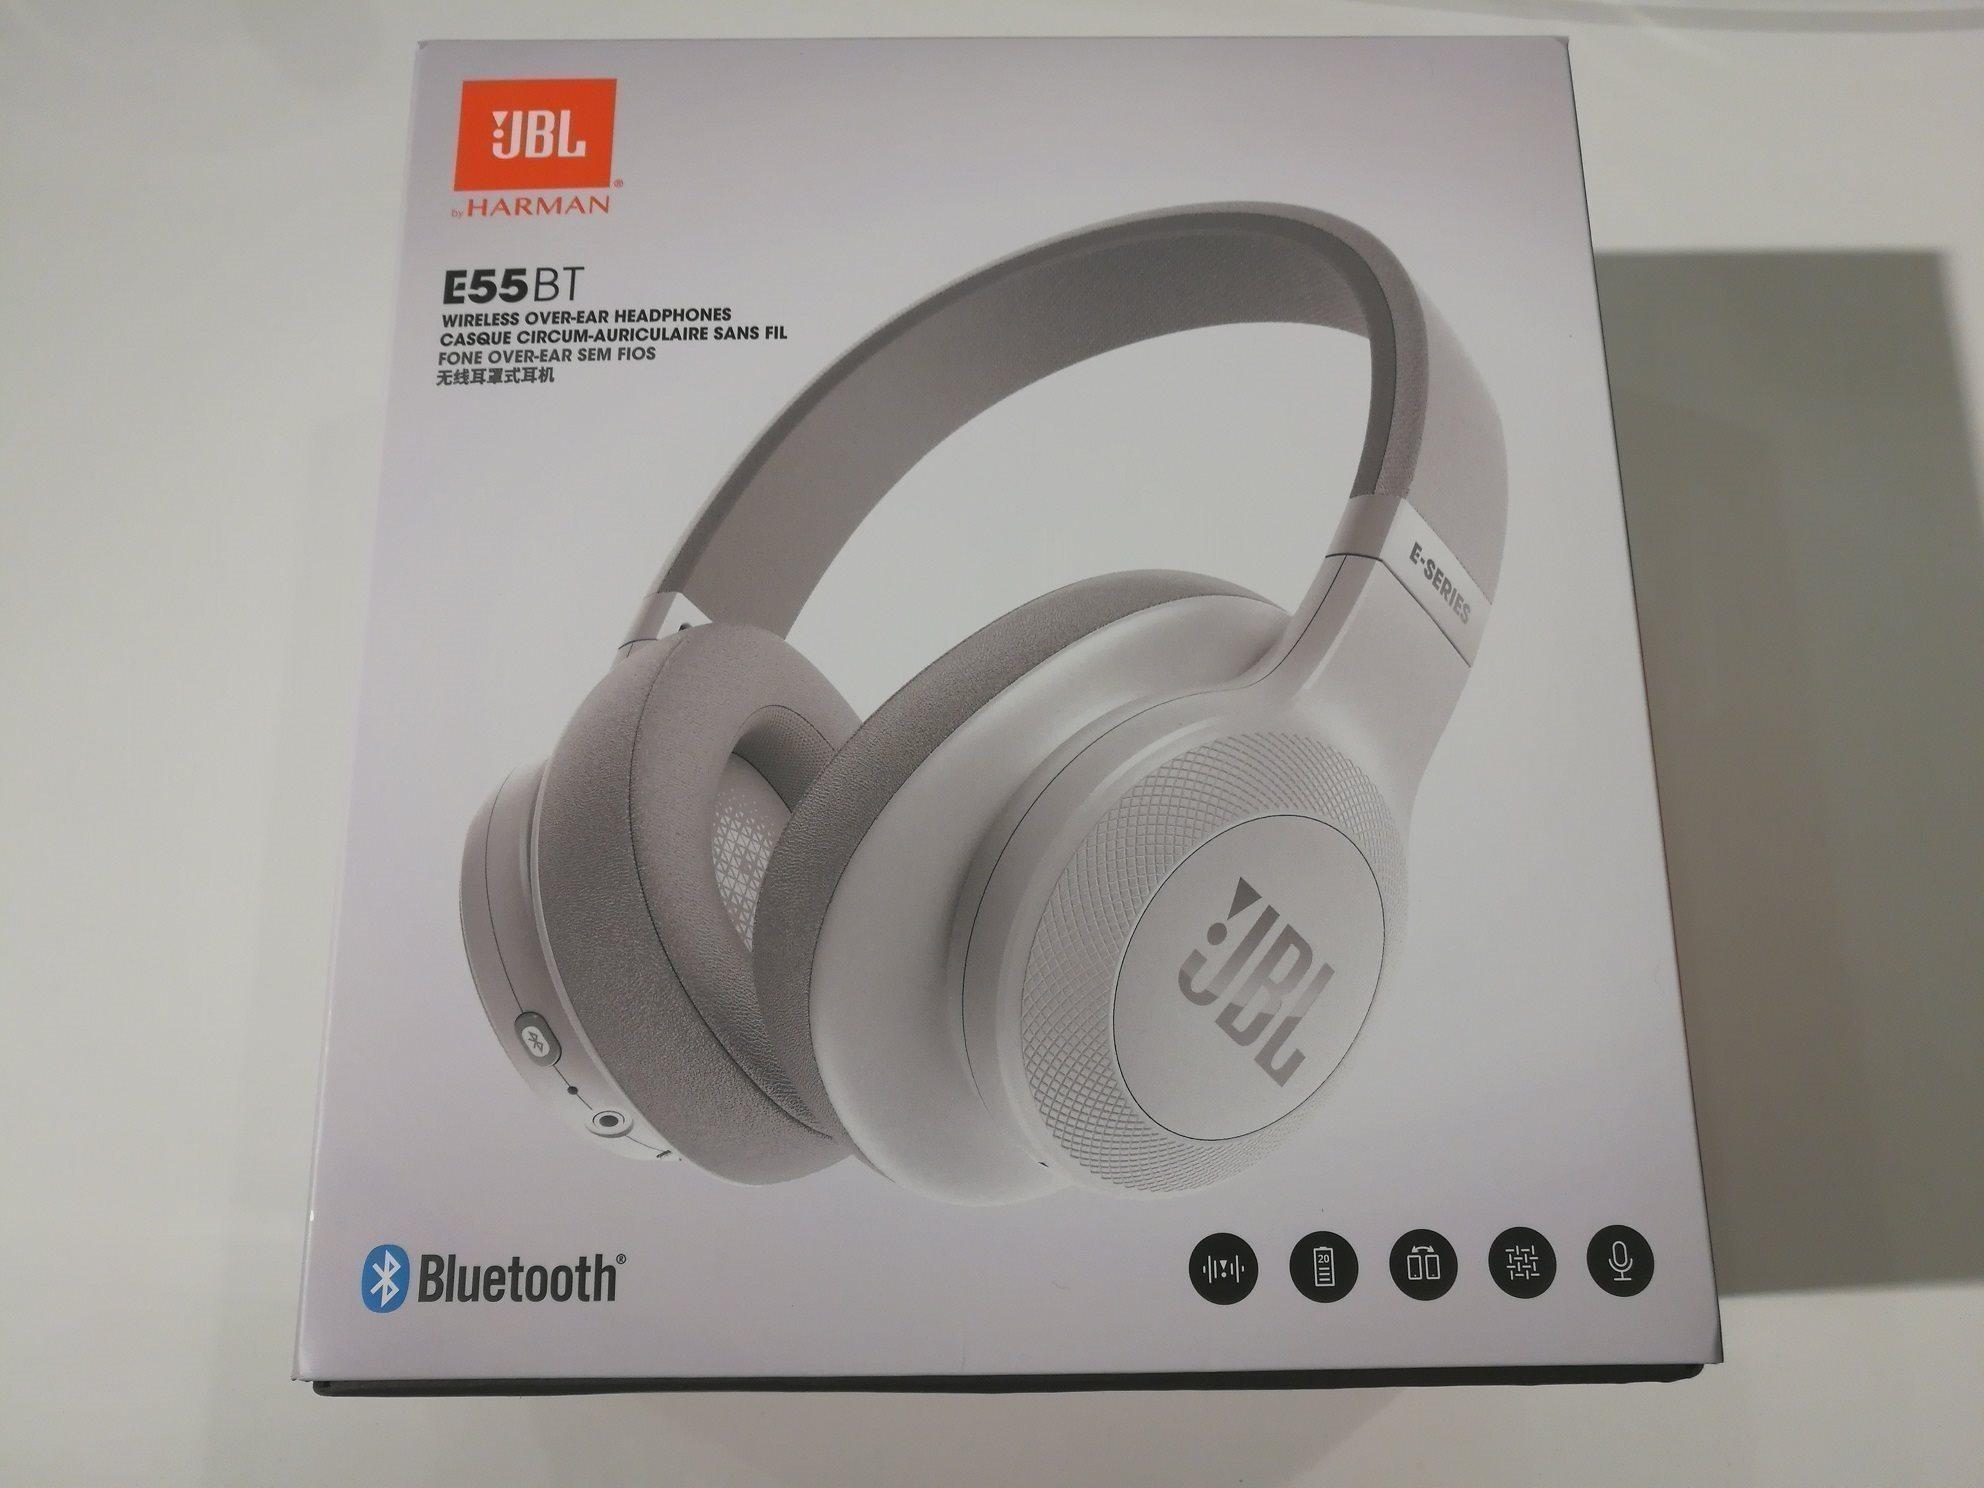 JBL E55 BLUETOOTH ON-EAR HÖRLUR.. (337432148) ᐈ cityexpertenovik på ... 6818514ef9c48